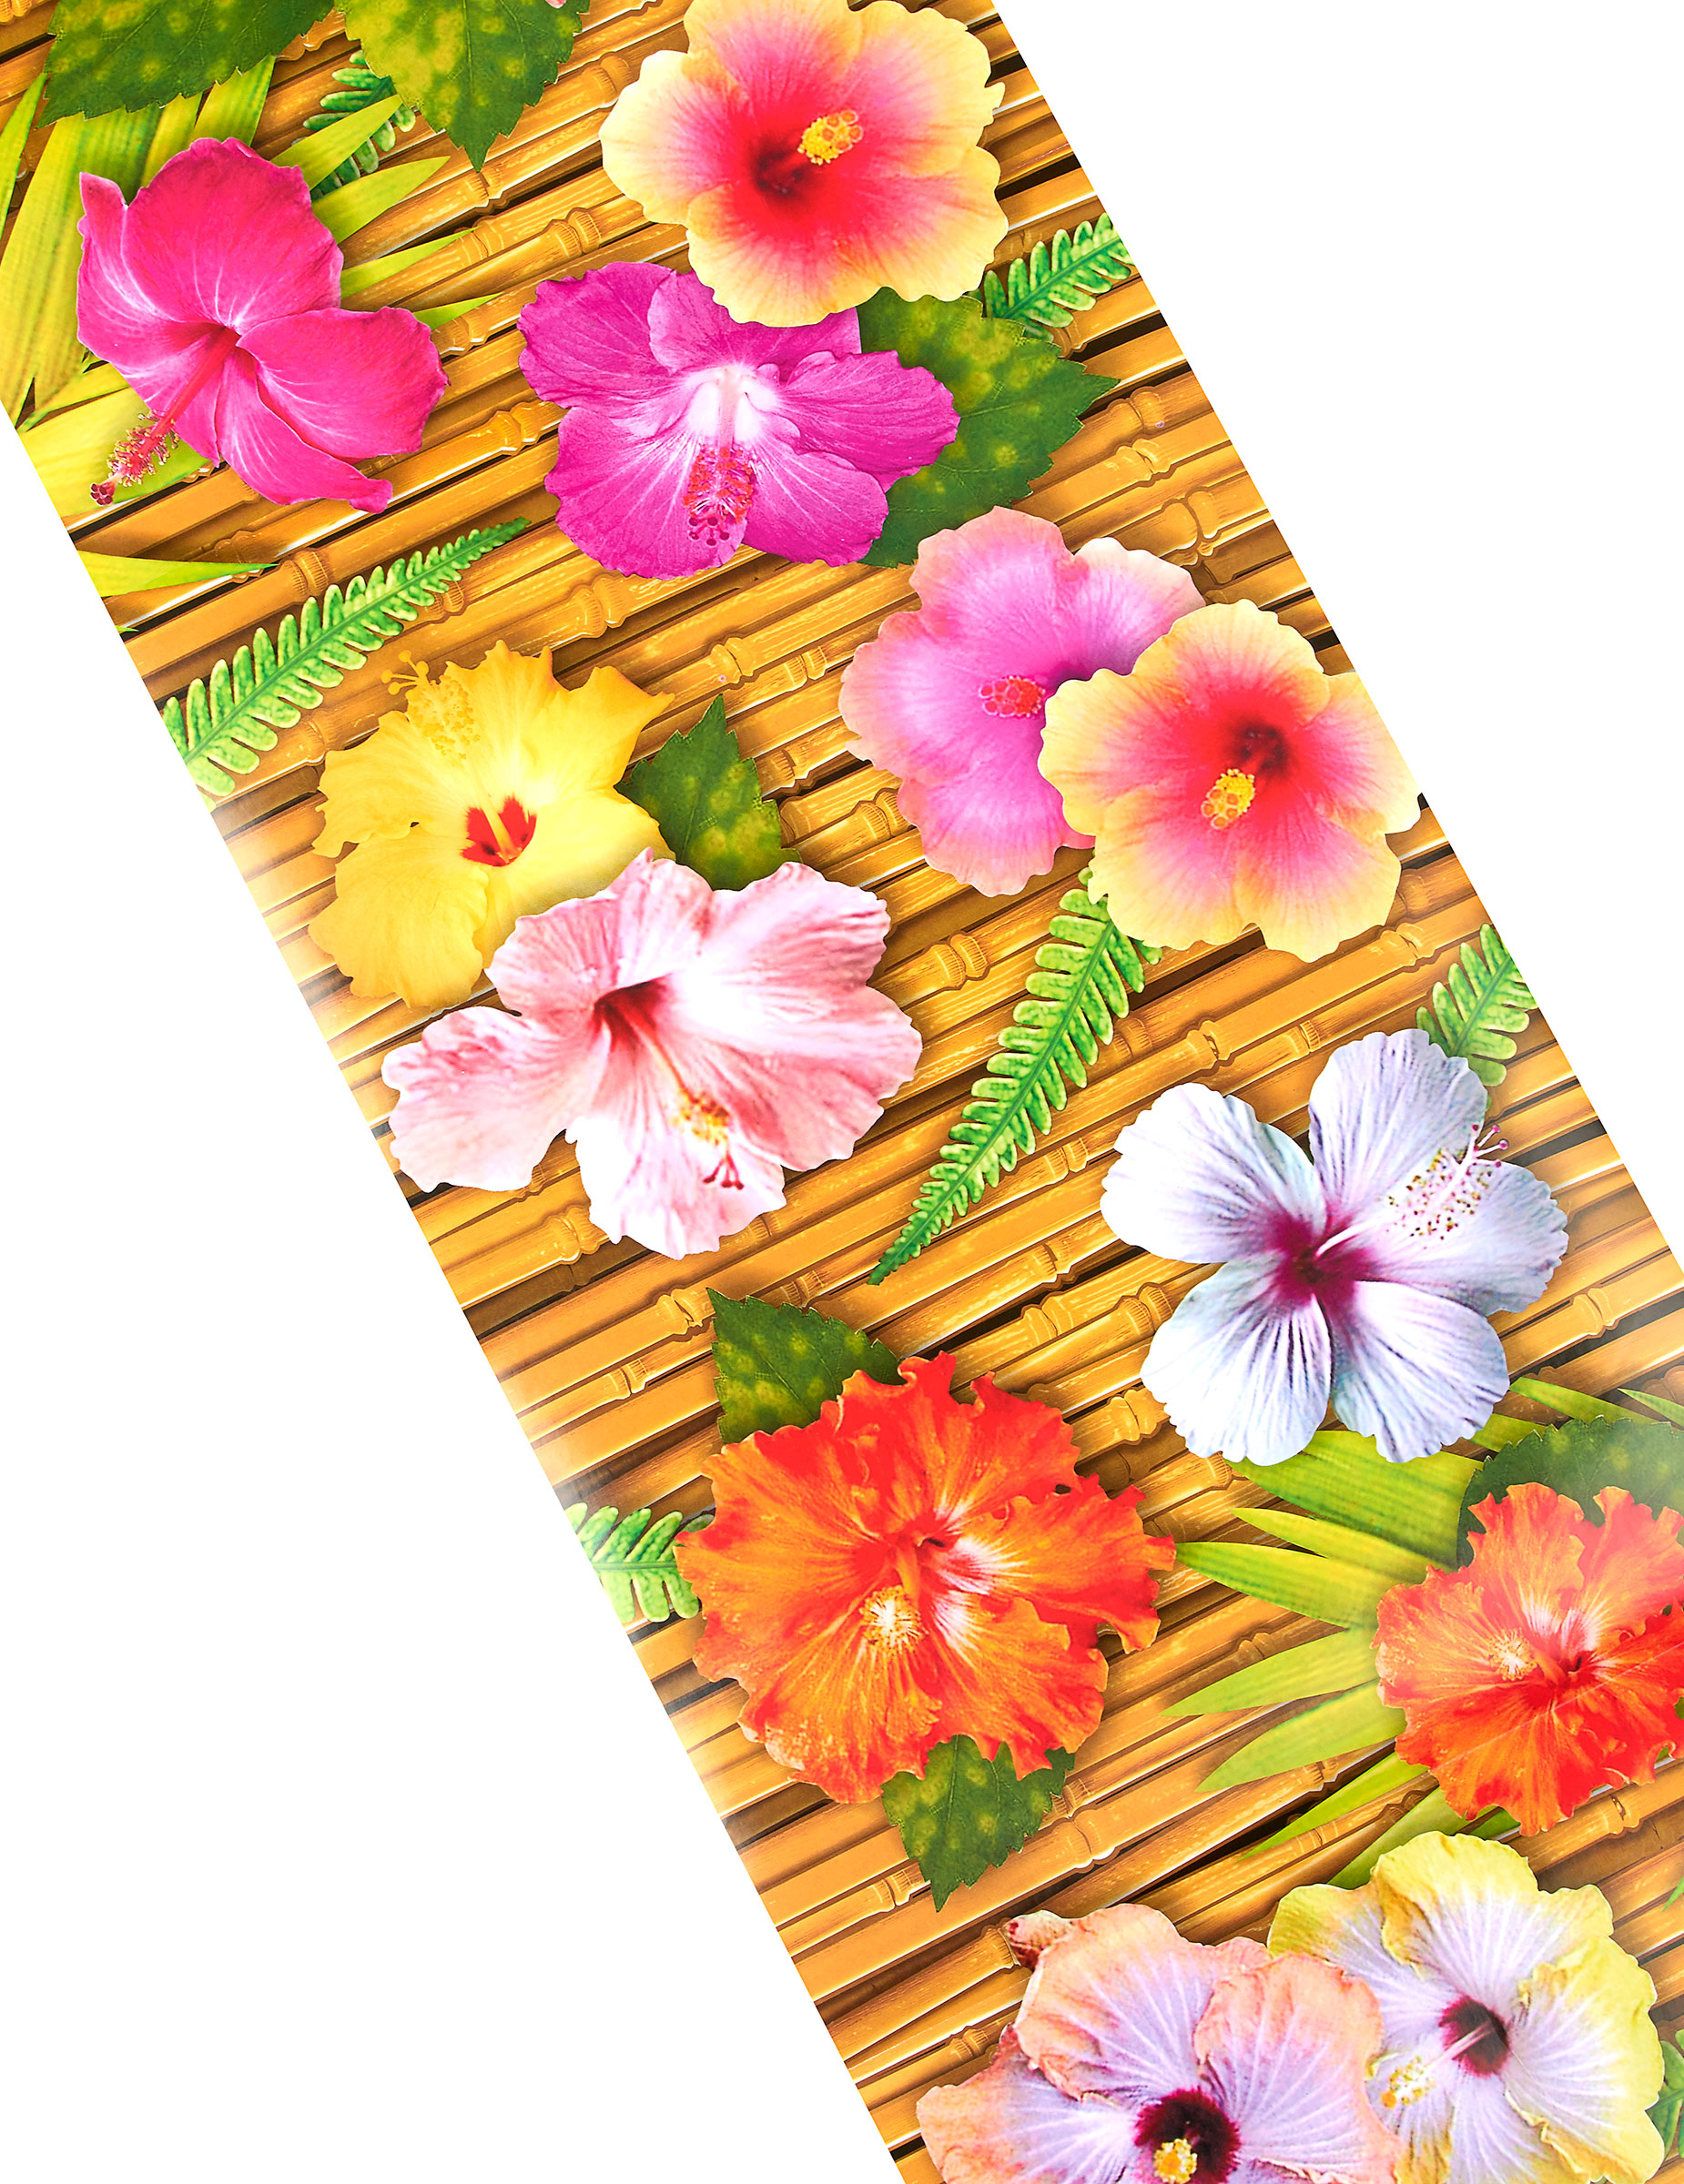 chemin de table fleur d'hibiscus hawaï 1.8 mètres : deguise-toi